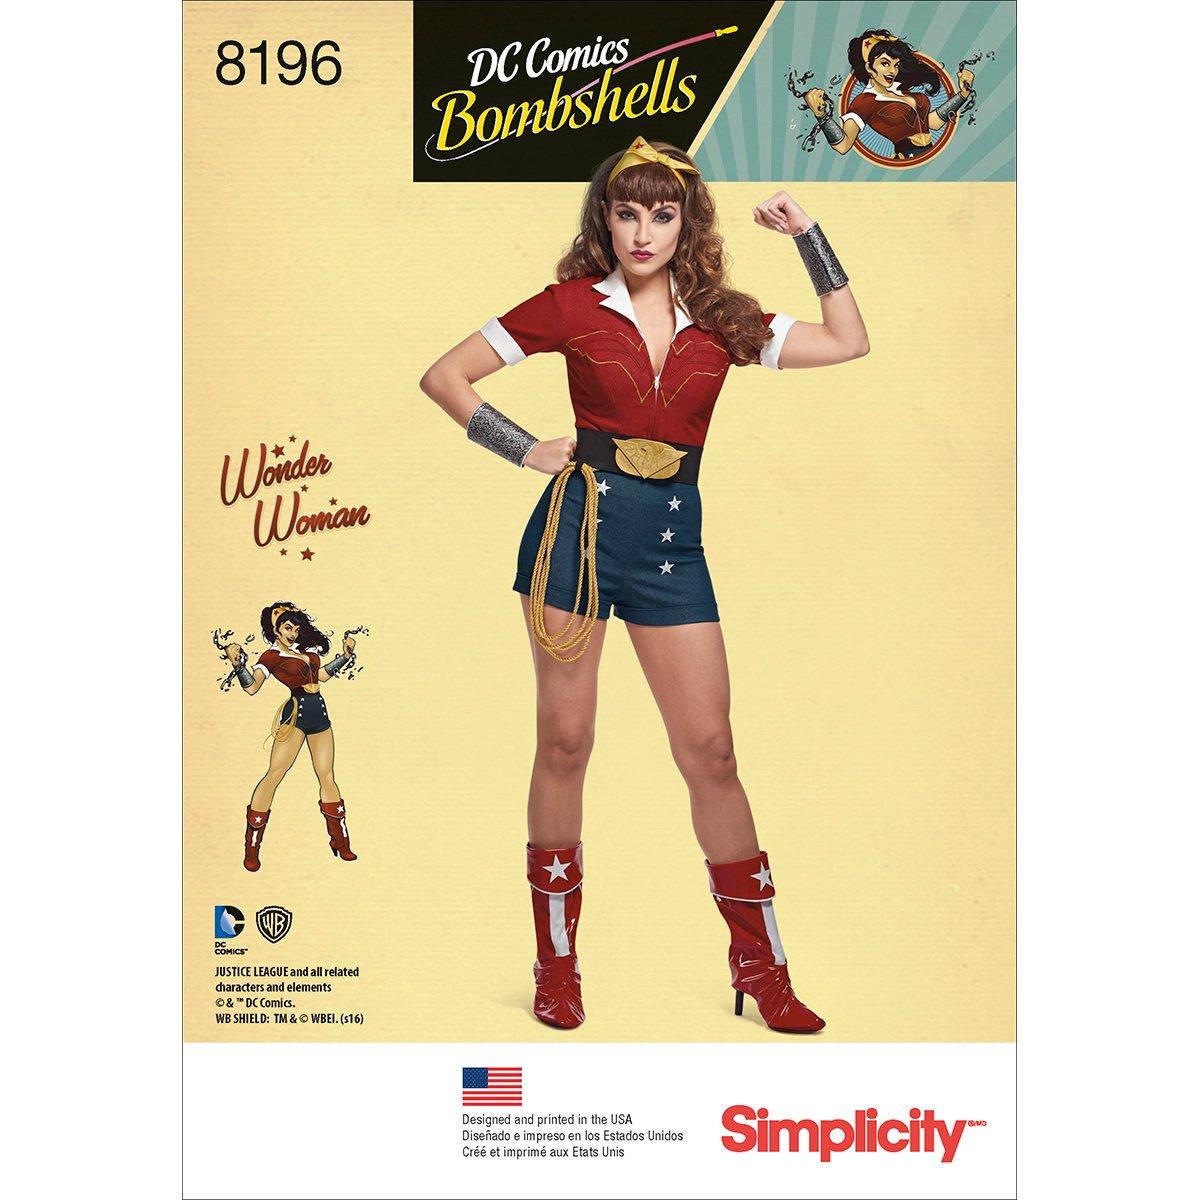 White 22.17 x 15.17 x 1.17 cm 6-8-10-12-14 Simplicity Pattern 8196 H5 Womens D.C Paper Comics Bombshells Wonder Woman Costum